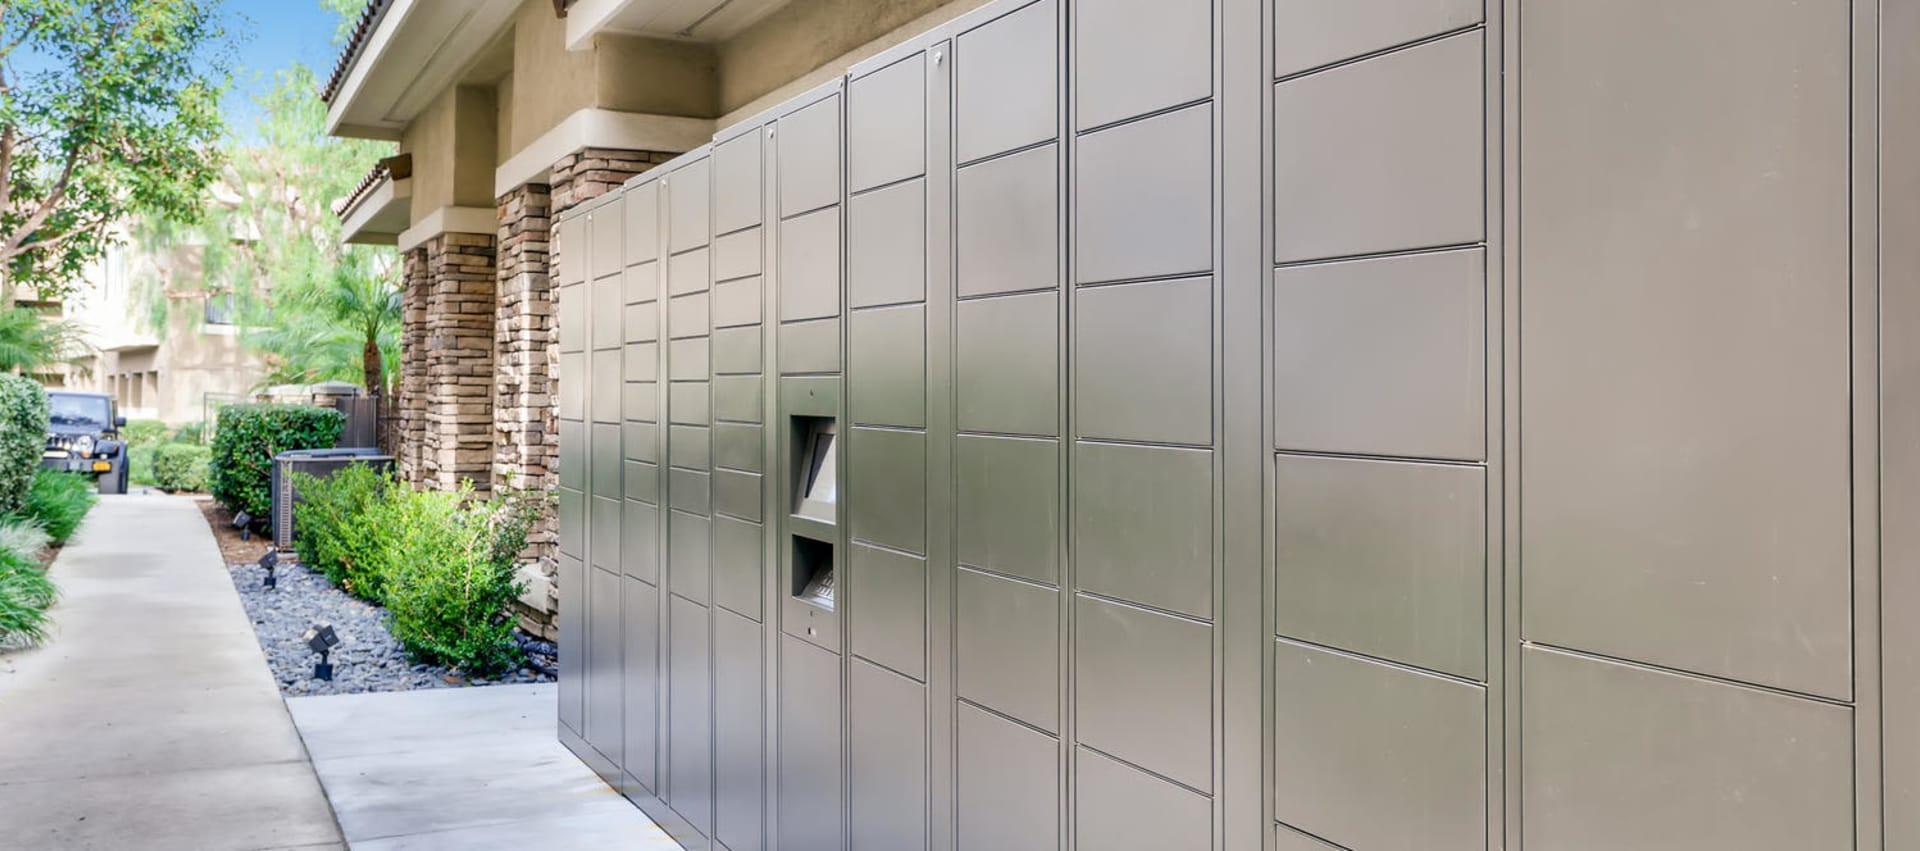 lockers at Alize at Aliso Viejo Apartment Homes in Aliso Viejo, California